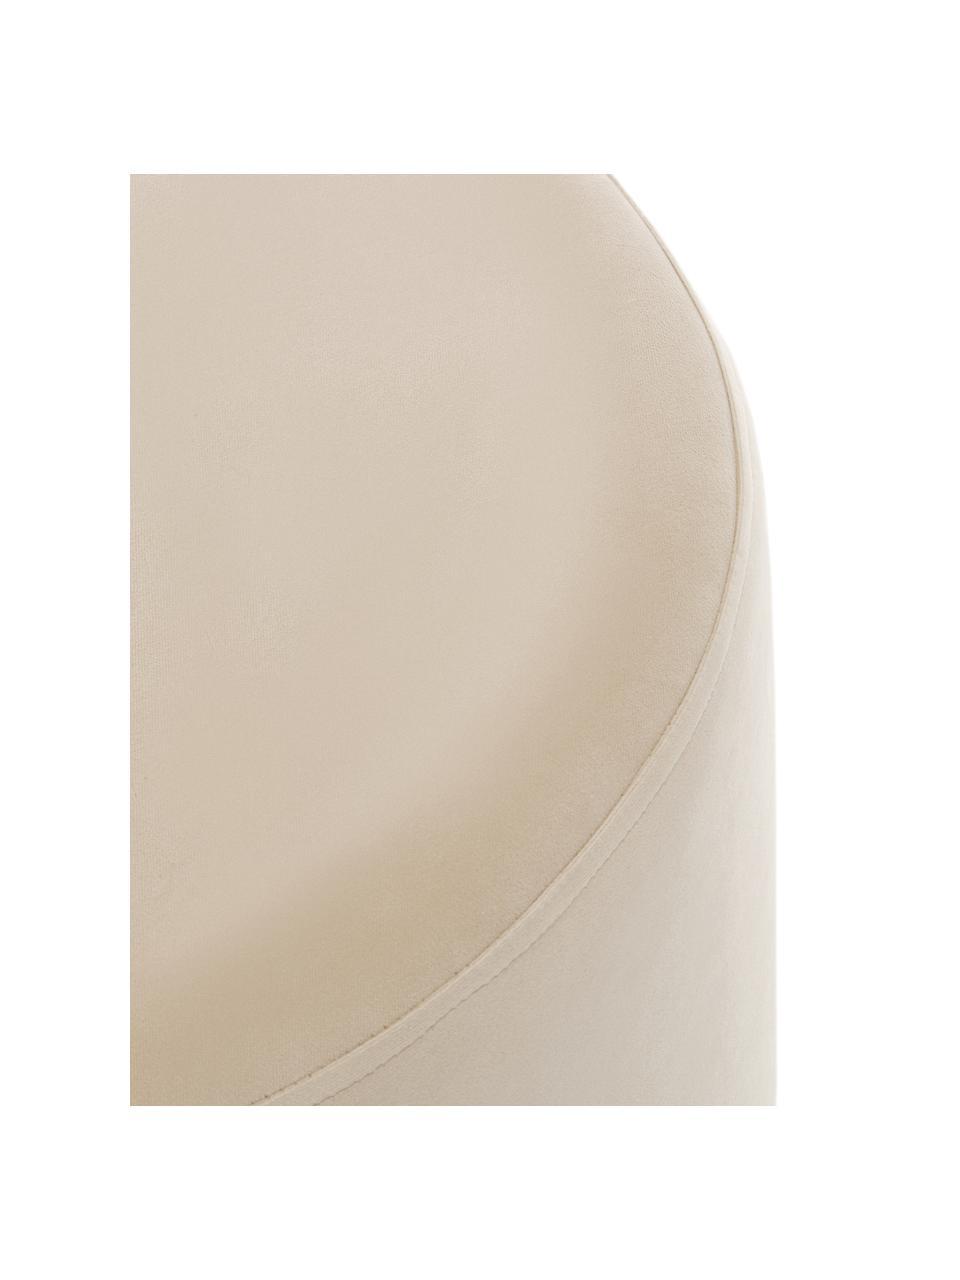 Samt-Hocker Daisy, Bezug: Samt (Polyester) Der hoch, Rahmen: Sperrholz, Samt Beige, Ø 54 x H 38 cm